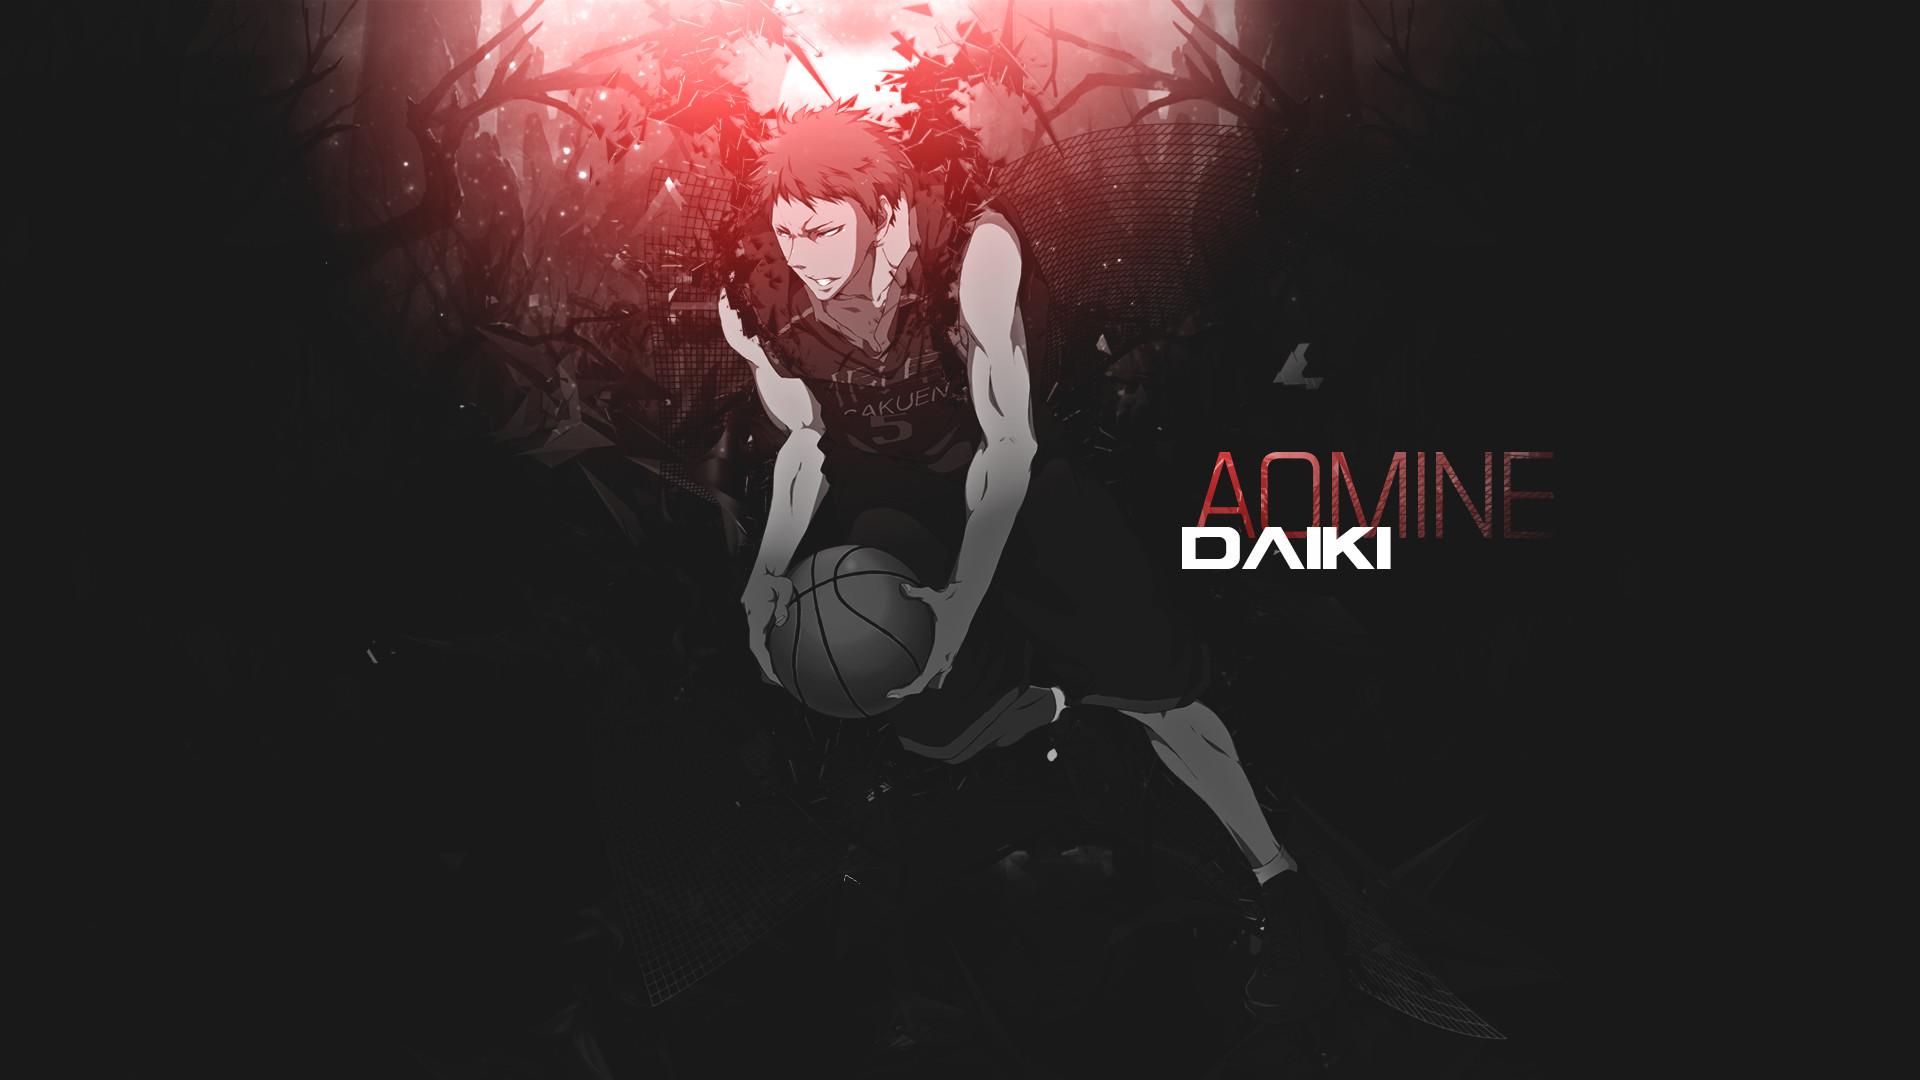 Anime – Kuroko's Basketball Daiki Aomine Wallpaper